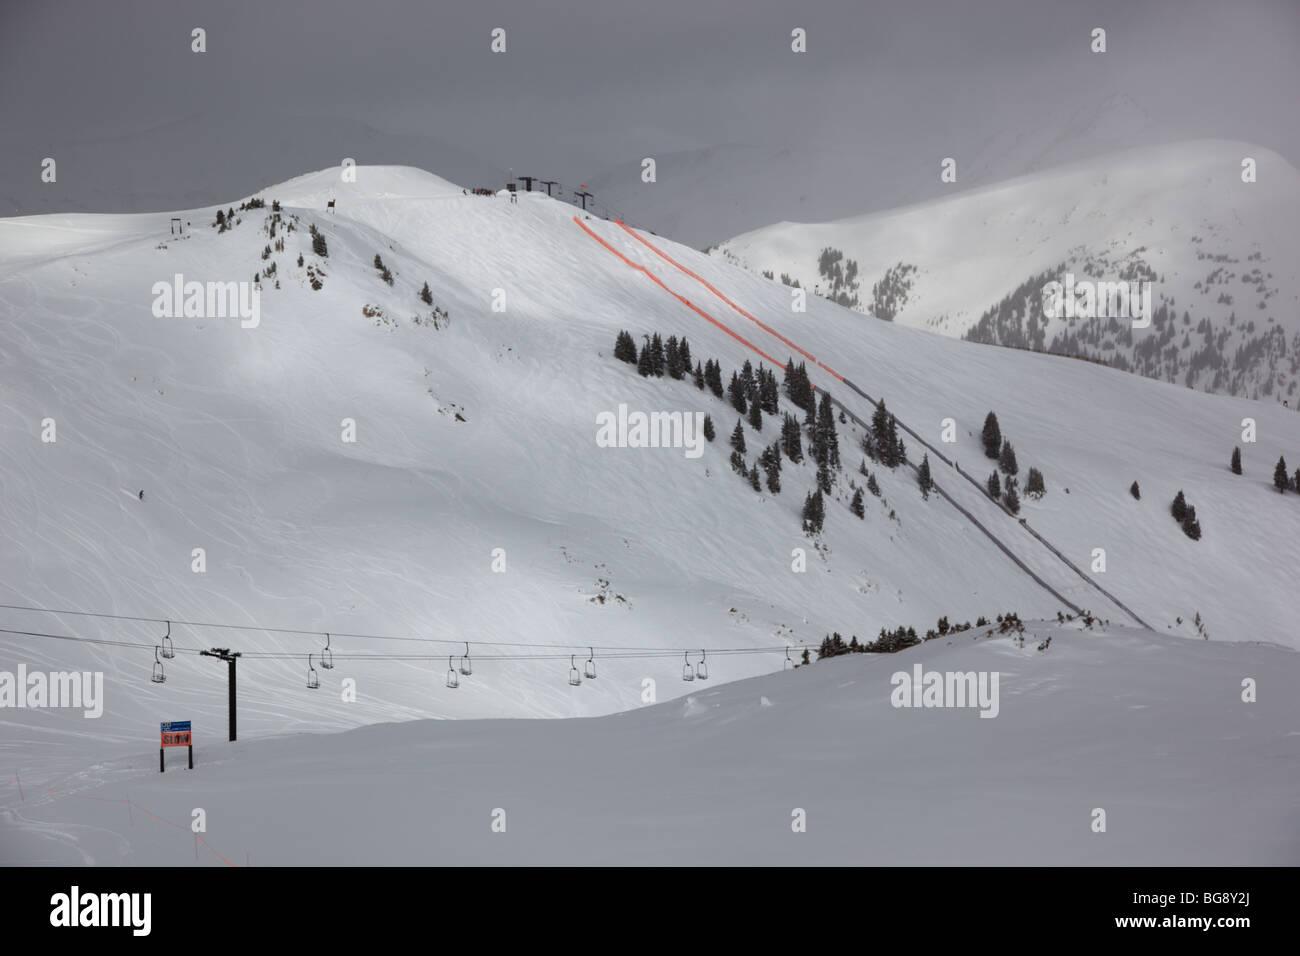 Arapahoe Basin ski area in Colorado USA - Stock Image